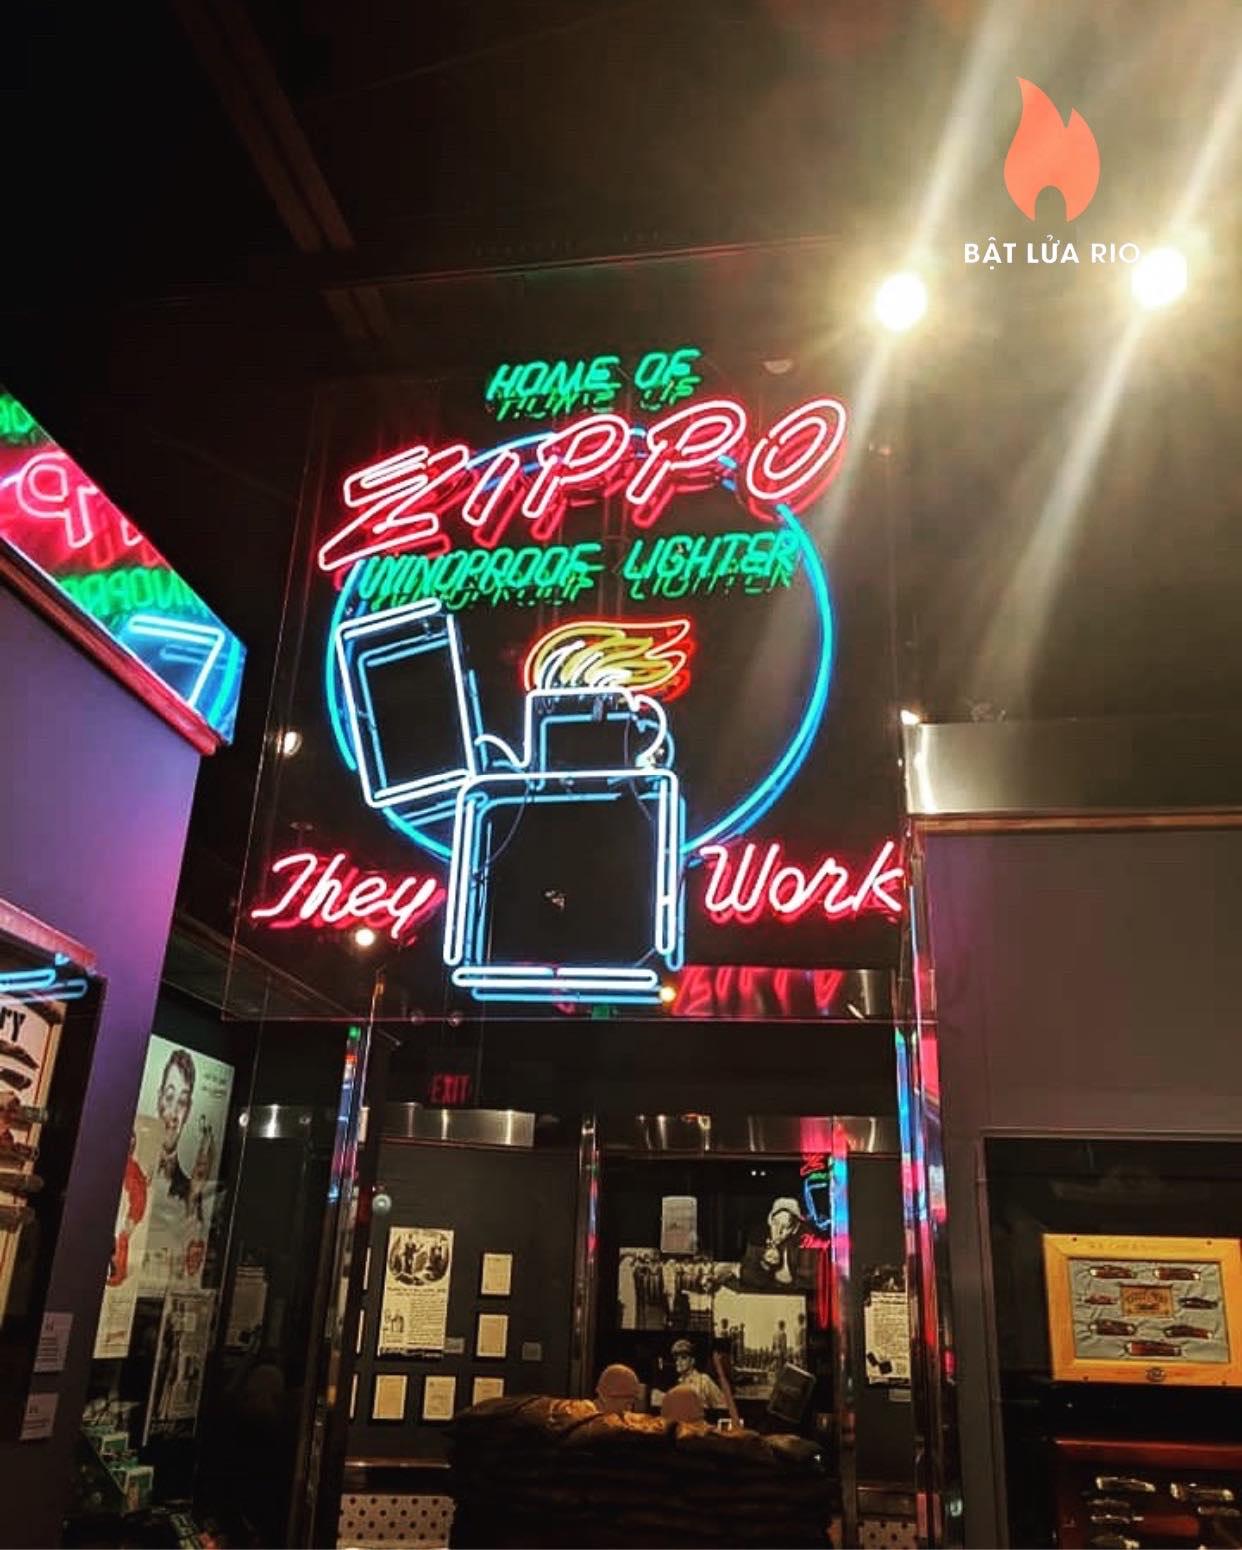 THAM QUAN BẢO TÀNG ZIPPO/CASE - ZIPPO/CASE MUSEUM 3